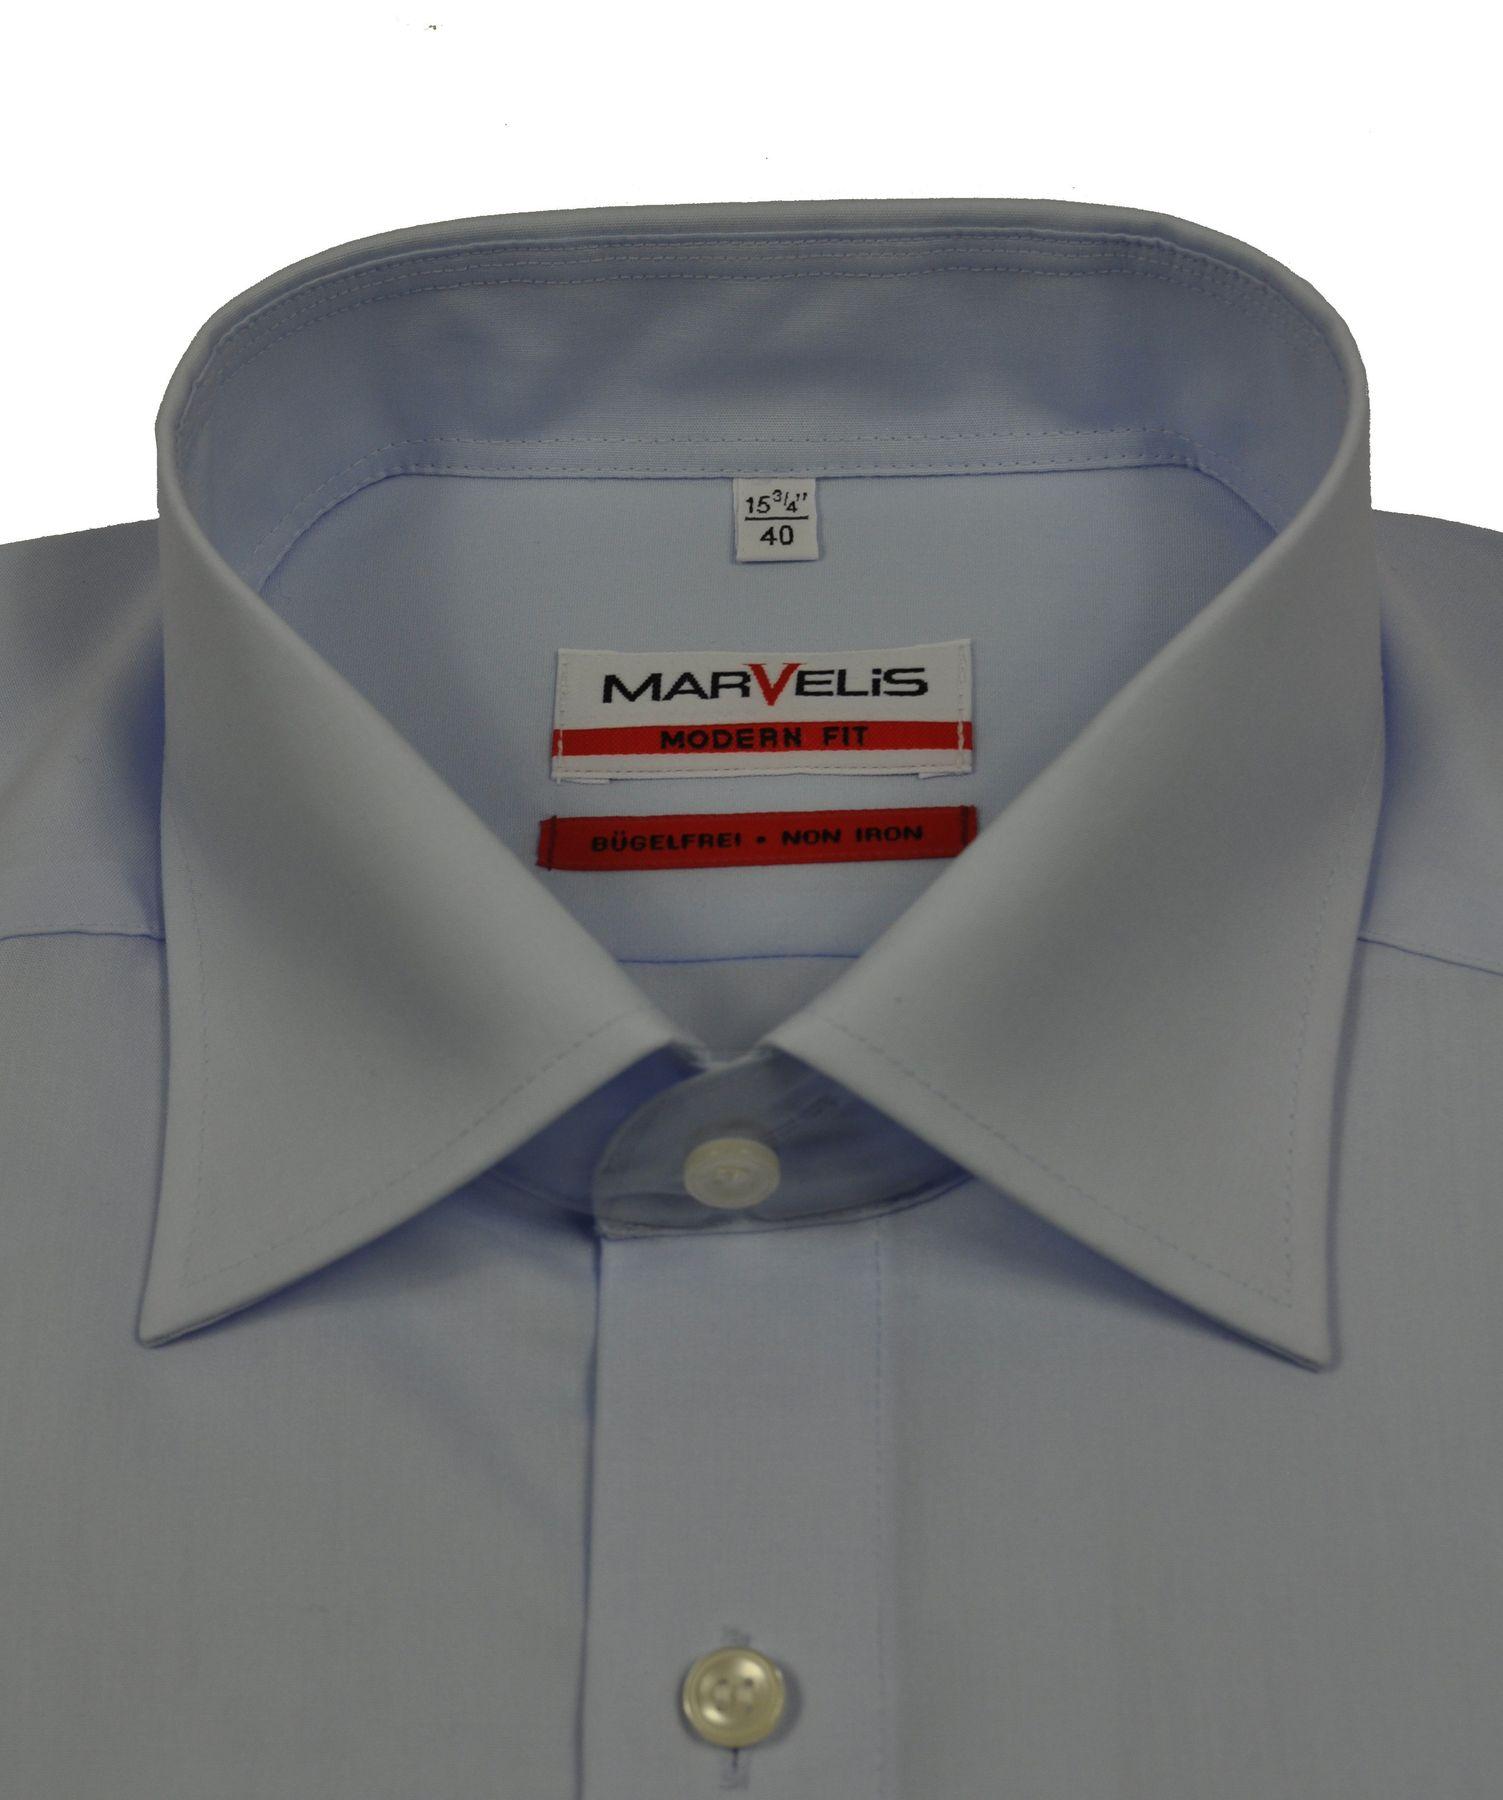 Marvelis - Modern Fit - Herren Langarm Hemd in verschiedenen Farben, Bügelfrei (4700/64) – Bild 3